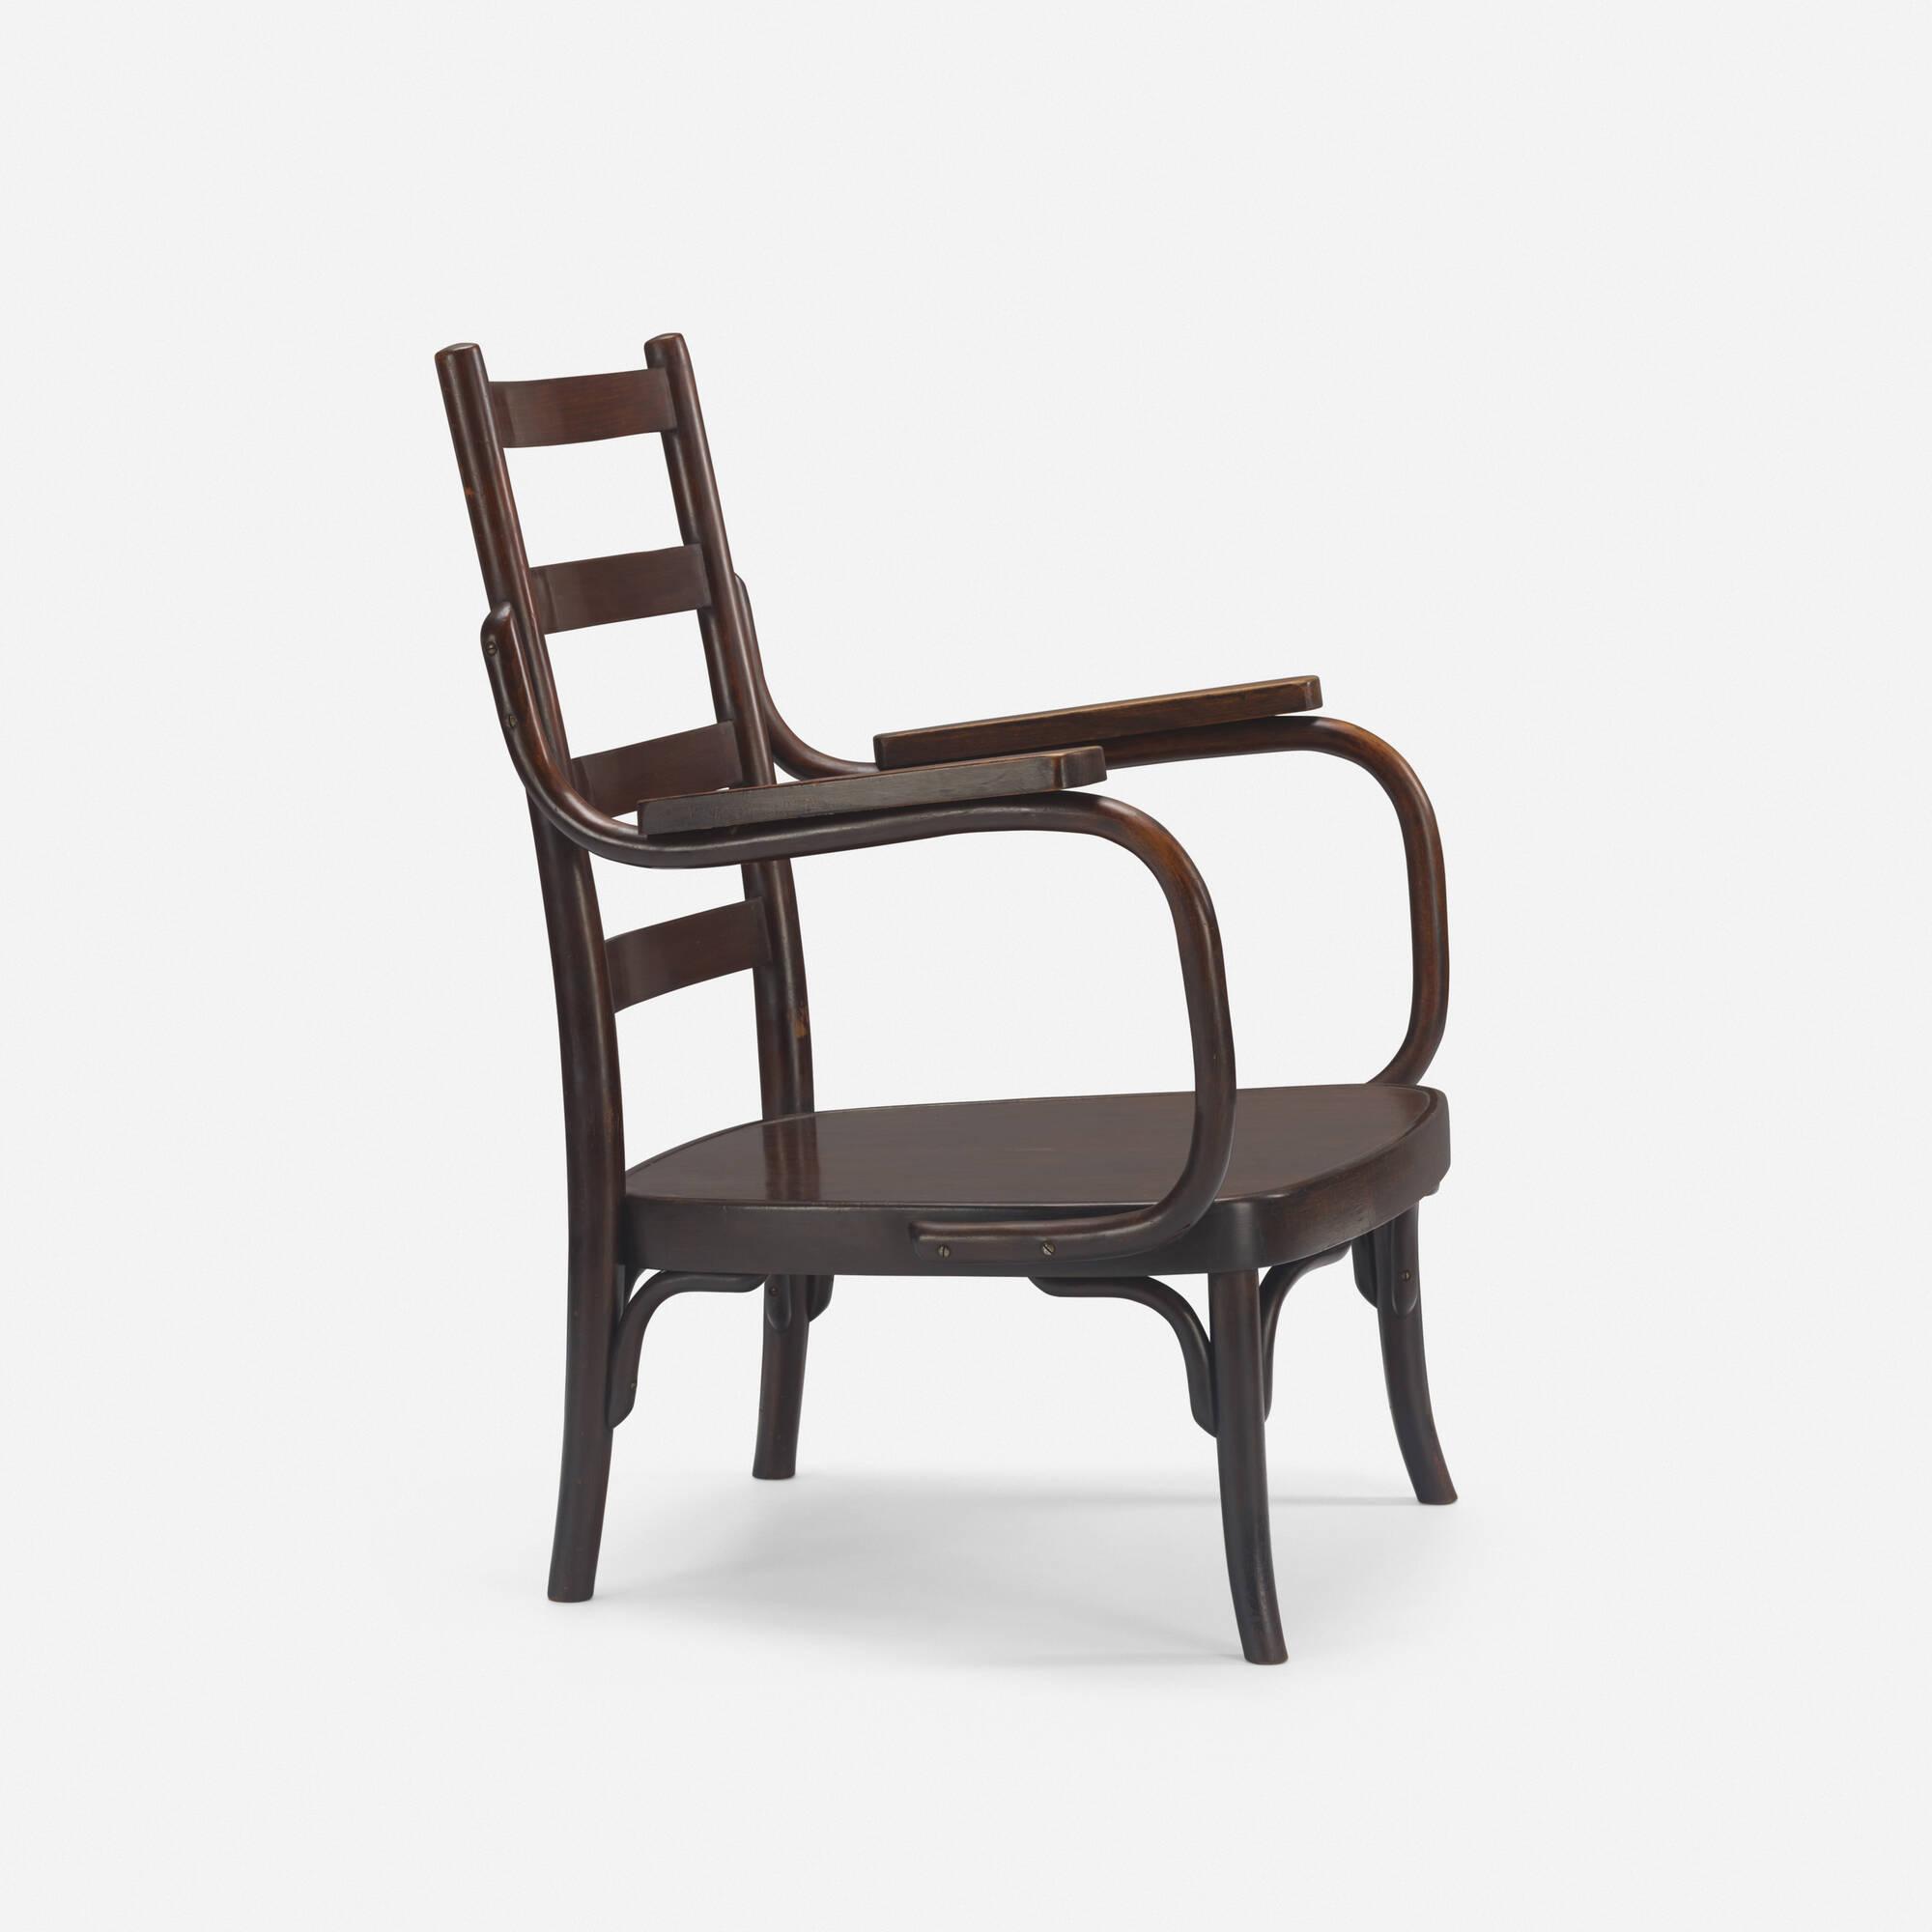 241: Josef Frank / armchair, model A403F (1 of 5)